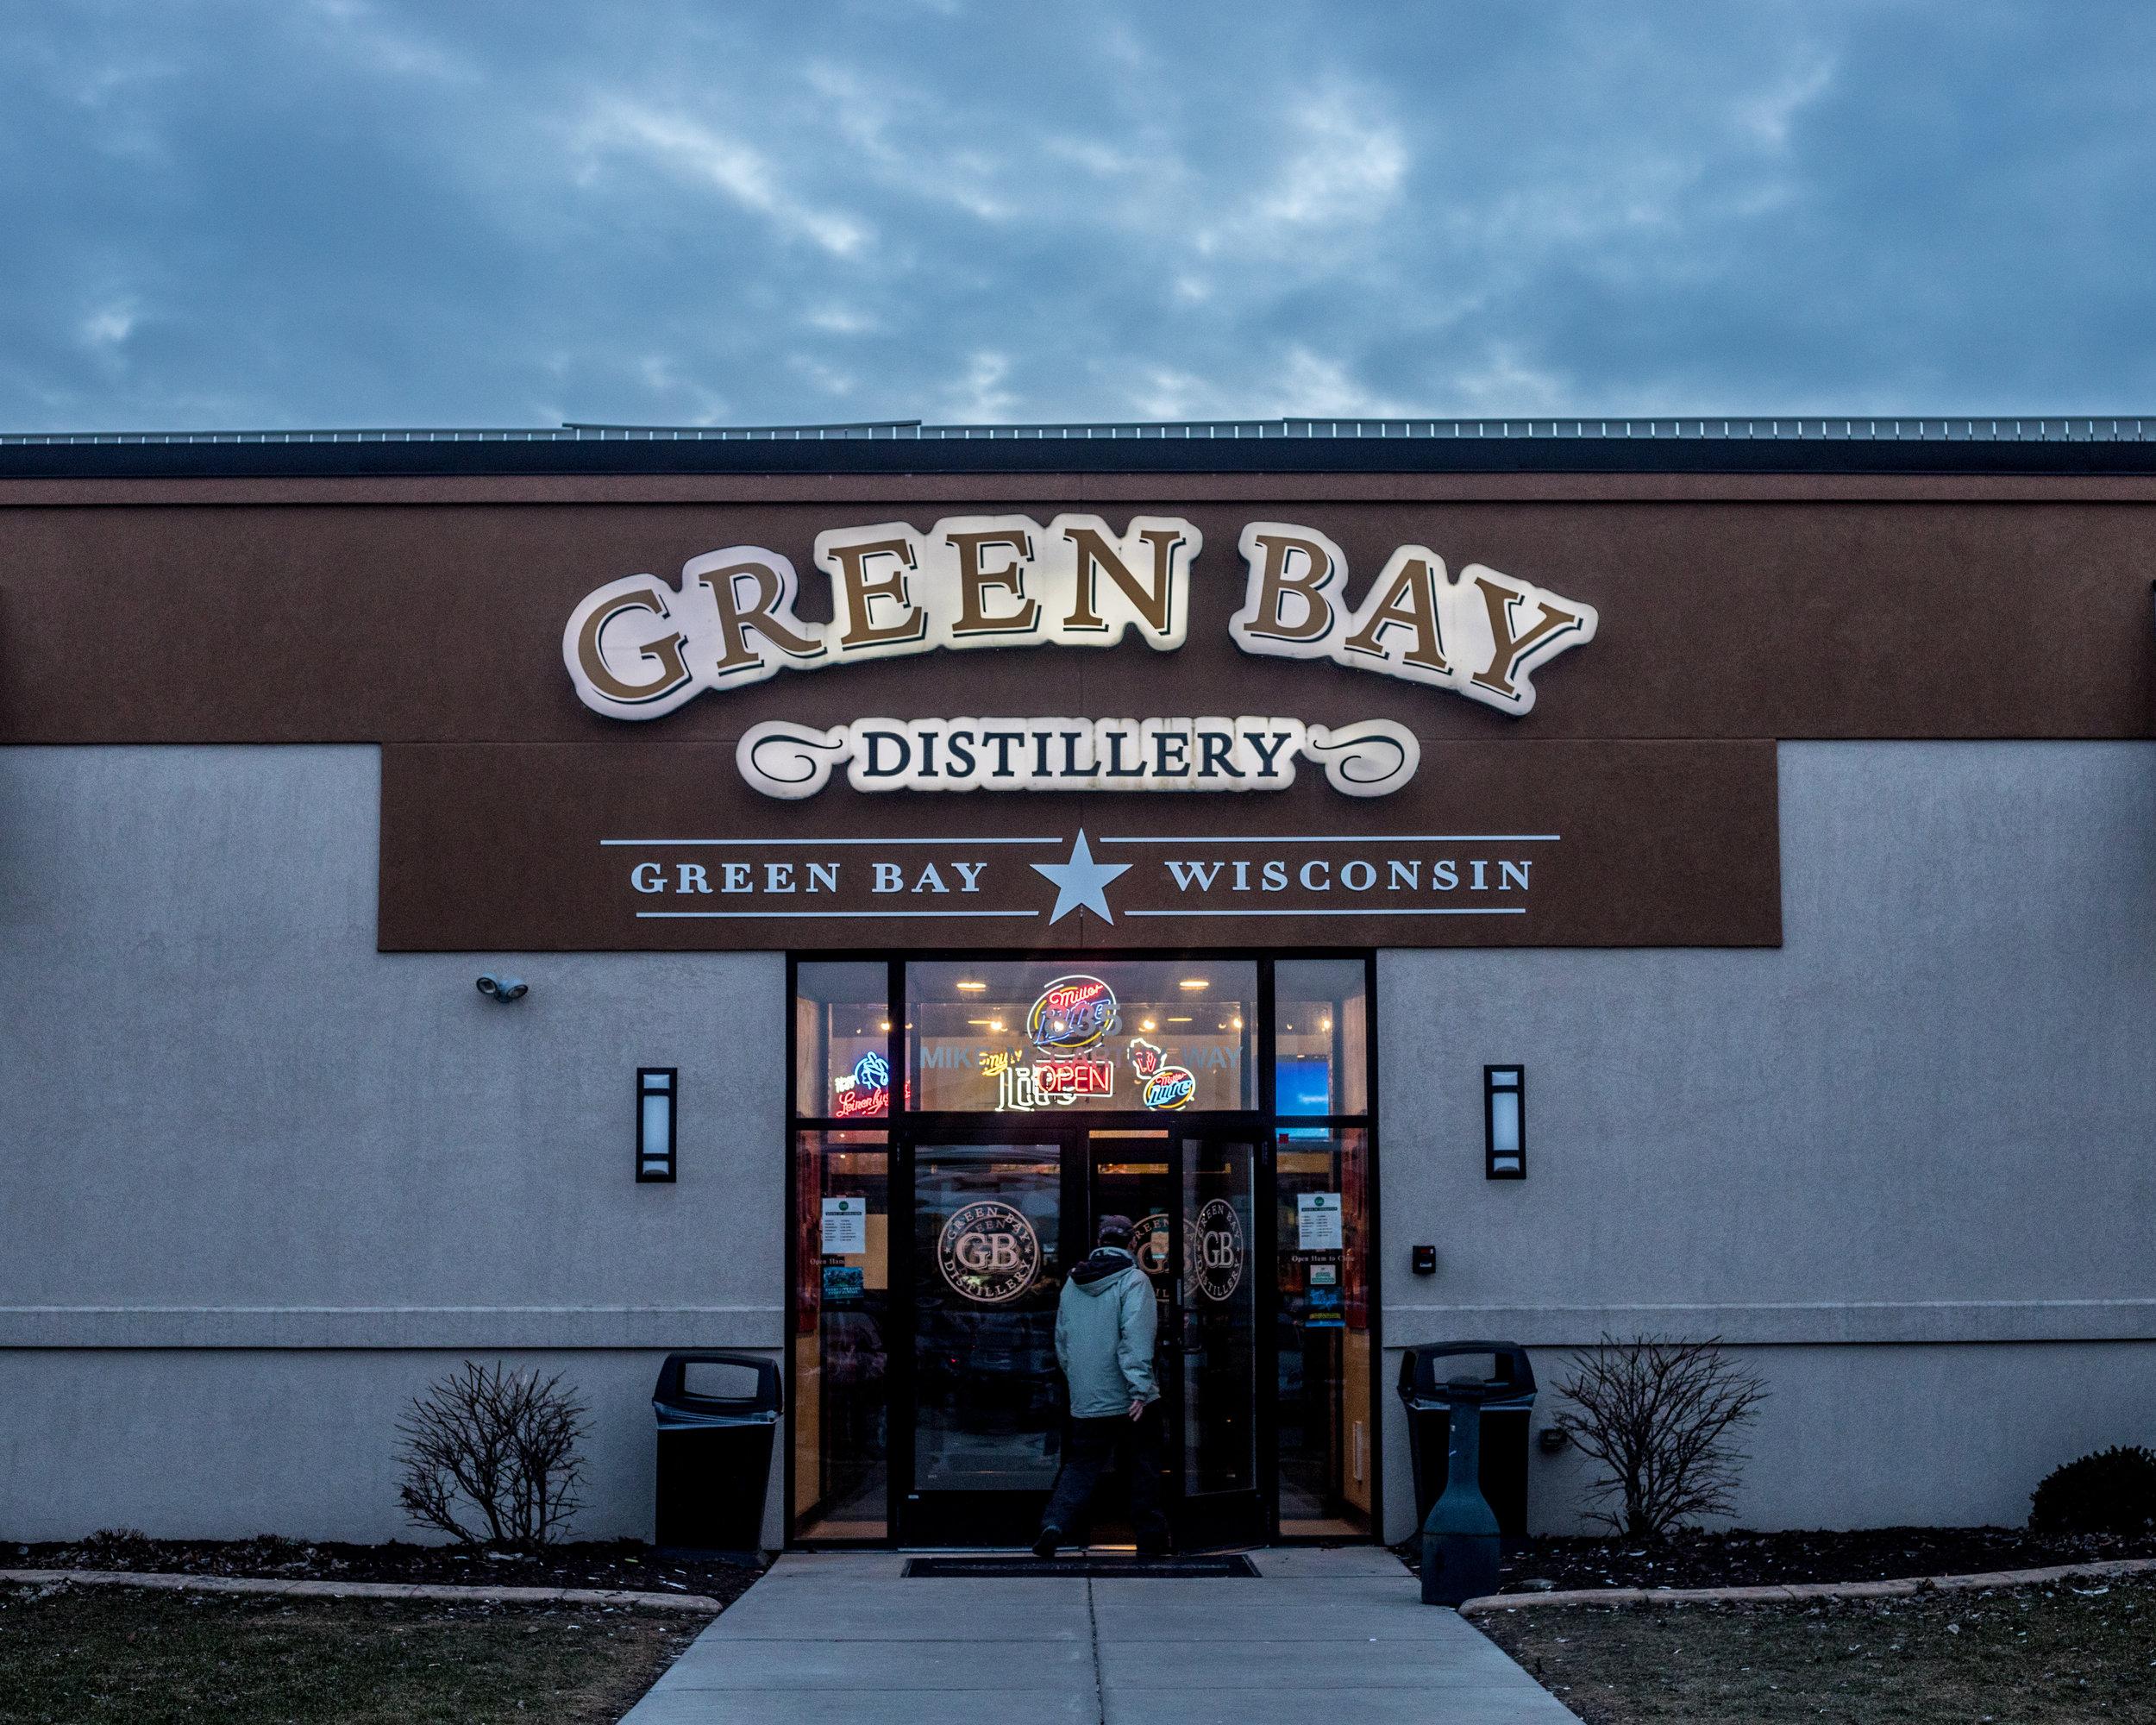 Green Bay Distillery: Green Bay, WI